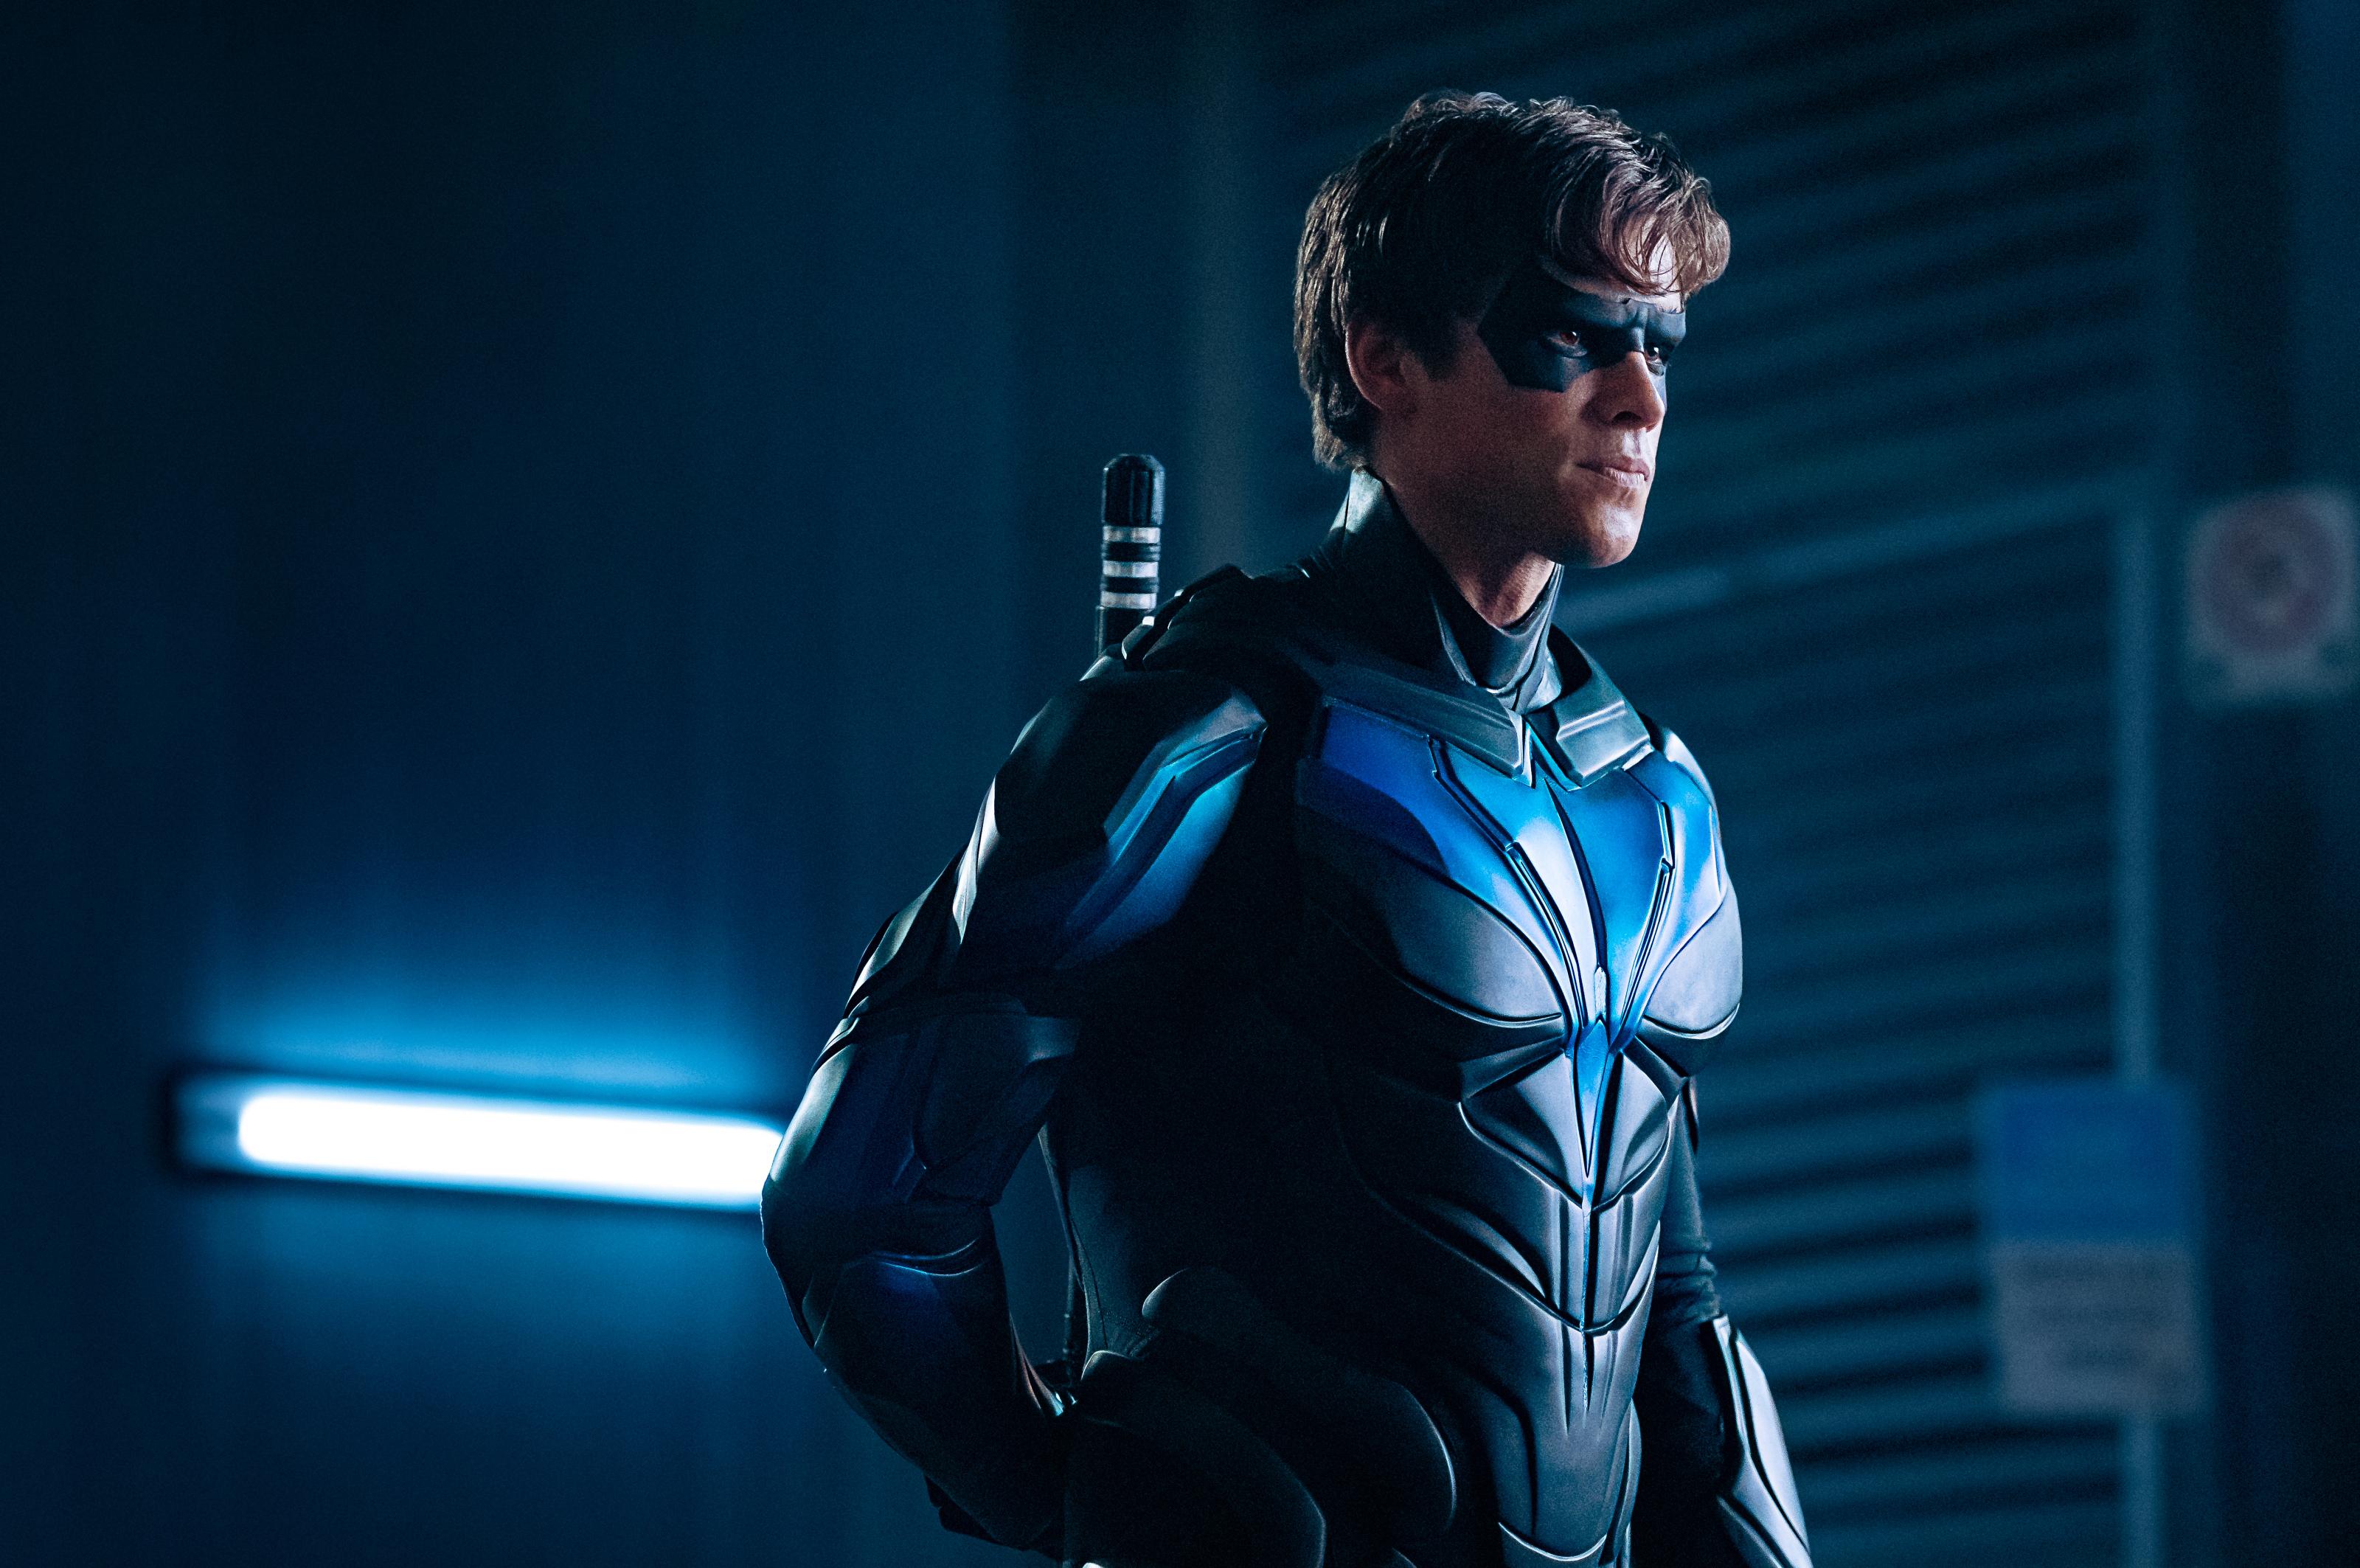 Nightwing Titans Tv Series by Timetravel6000v2 on DeviantArt